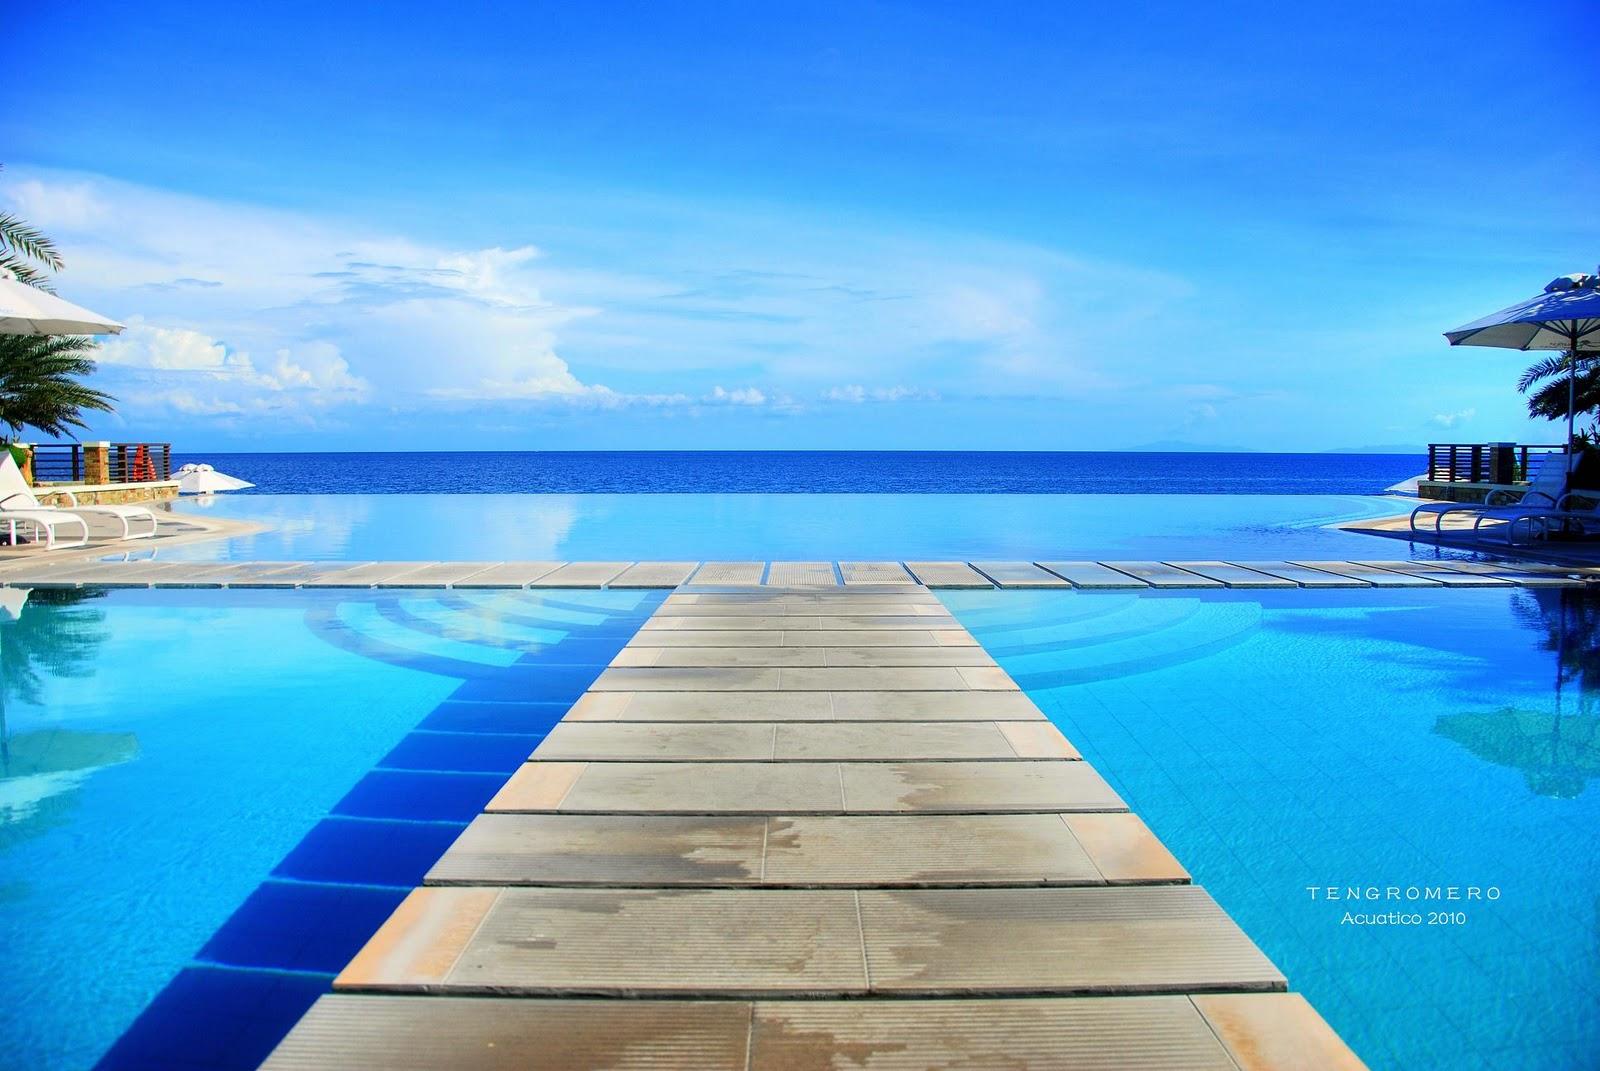 Tengturista acuatico the best infinity pool in laiya for Infinity pool